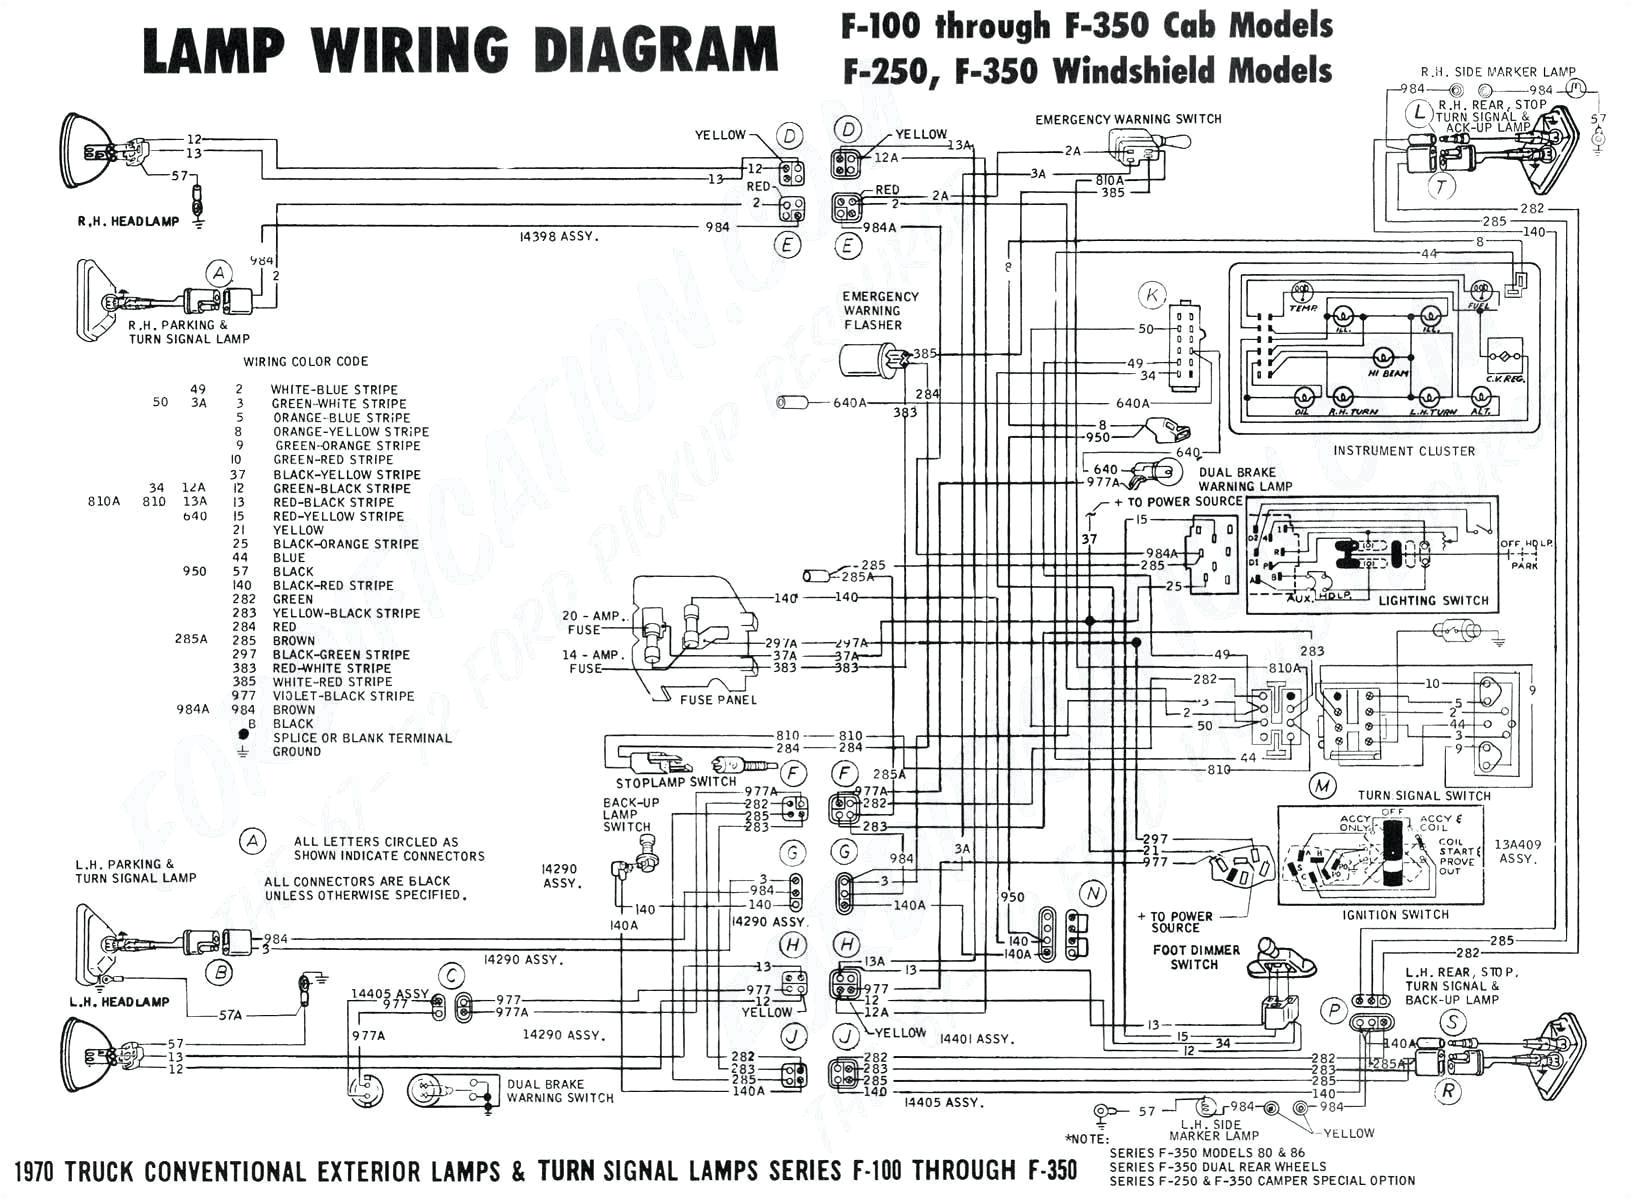 sabre lawn mower wiring diagram beautiful john deere garden tractor wiring diagram explained wiring diagrams